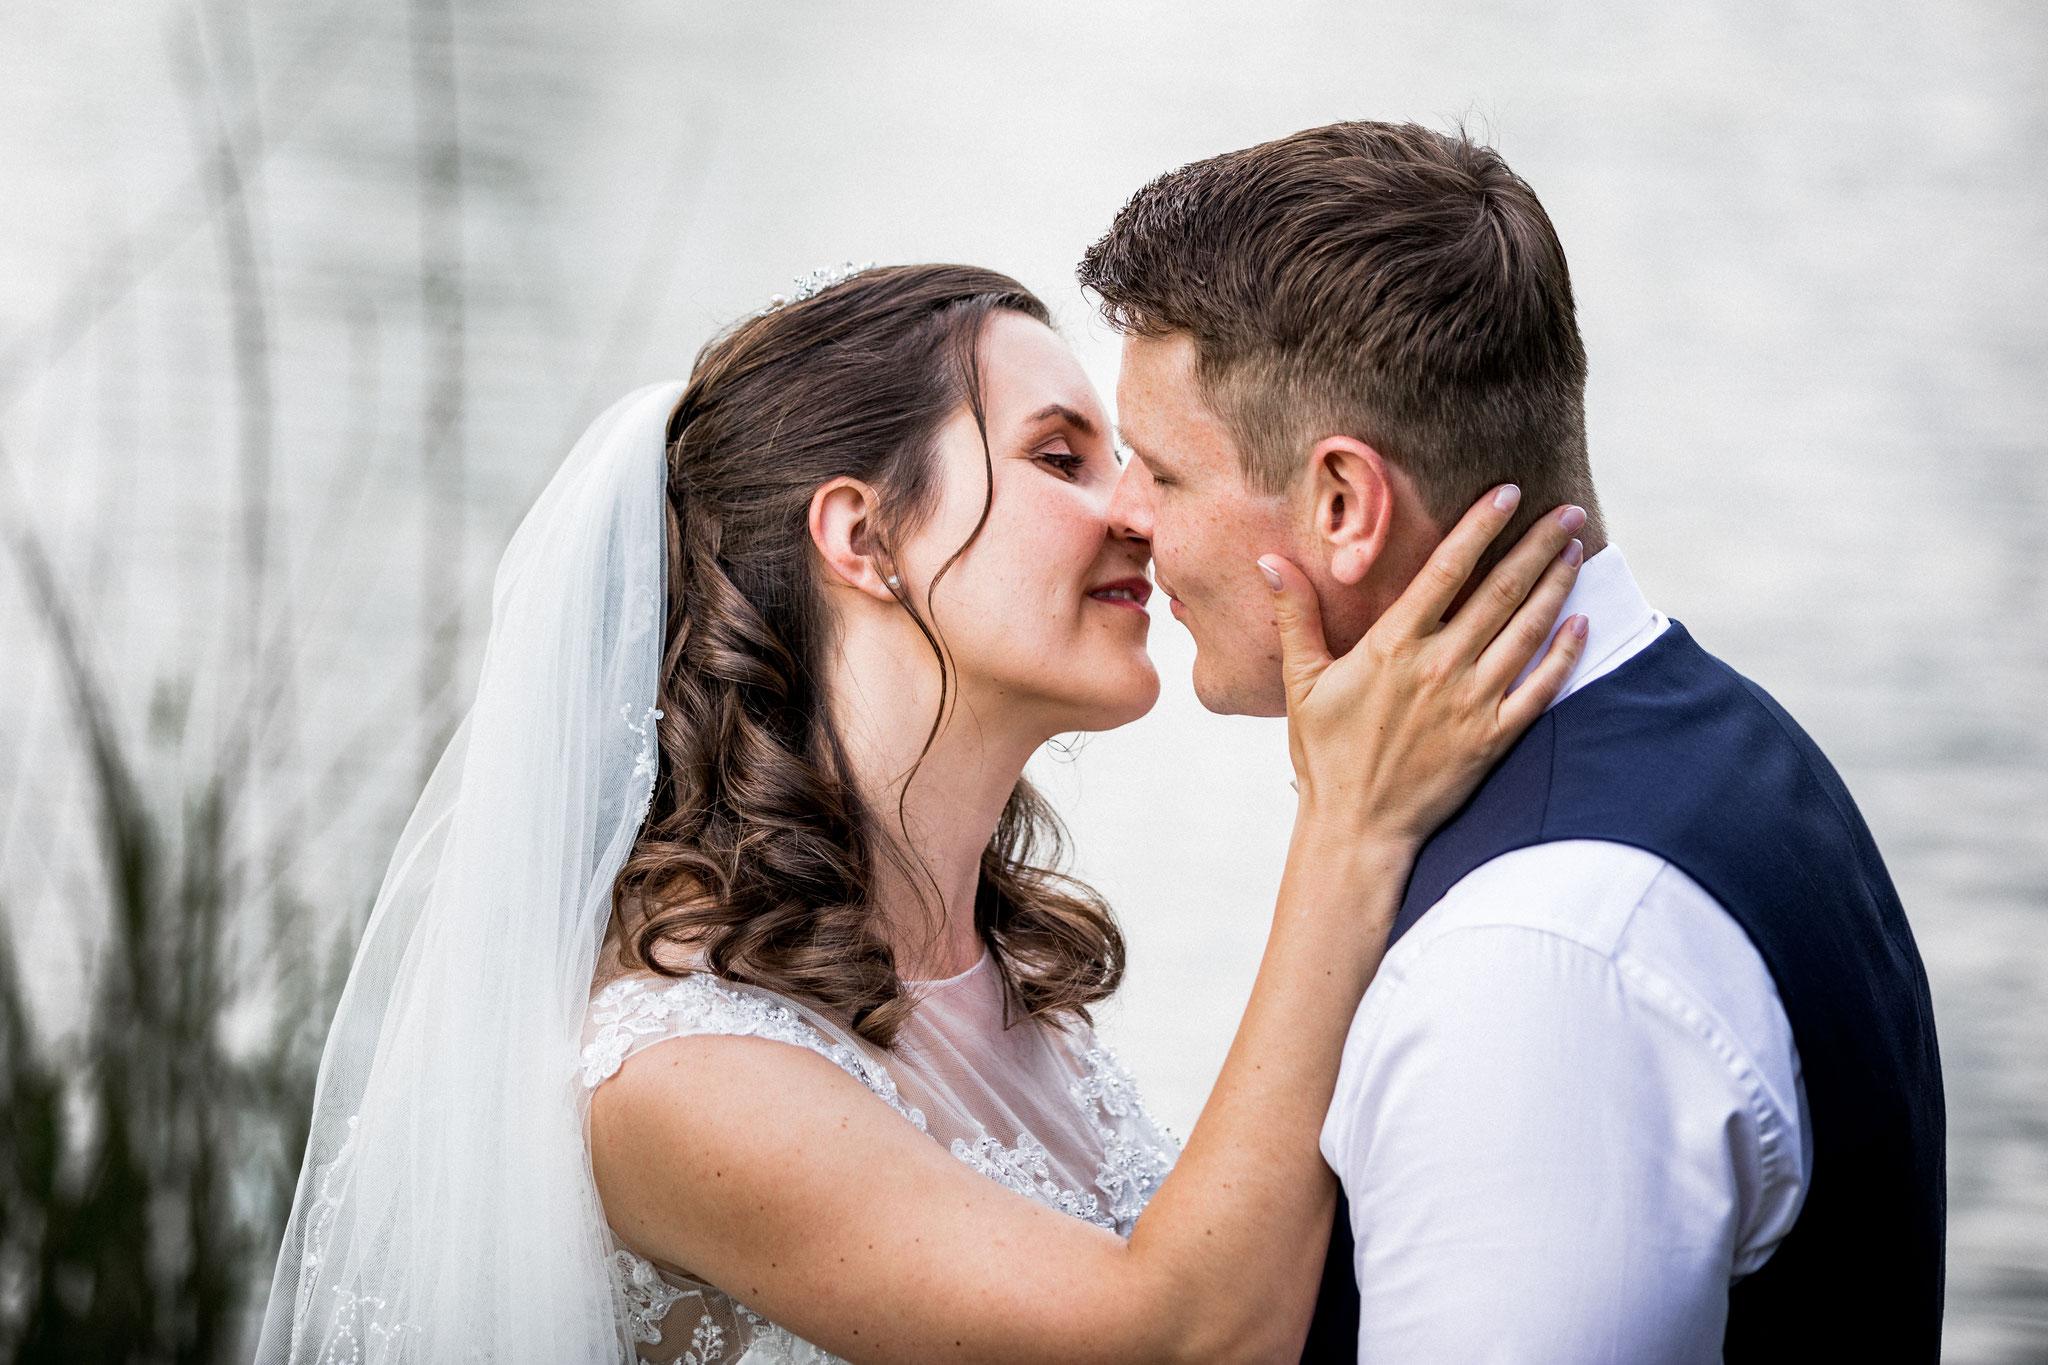 liebevoller Kuss